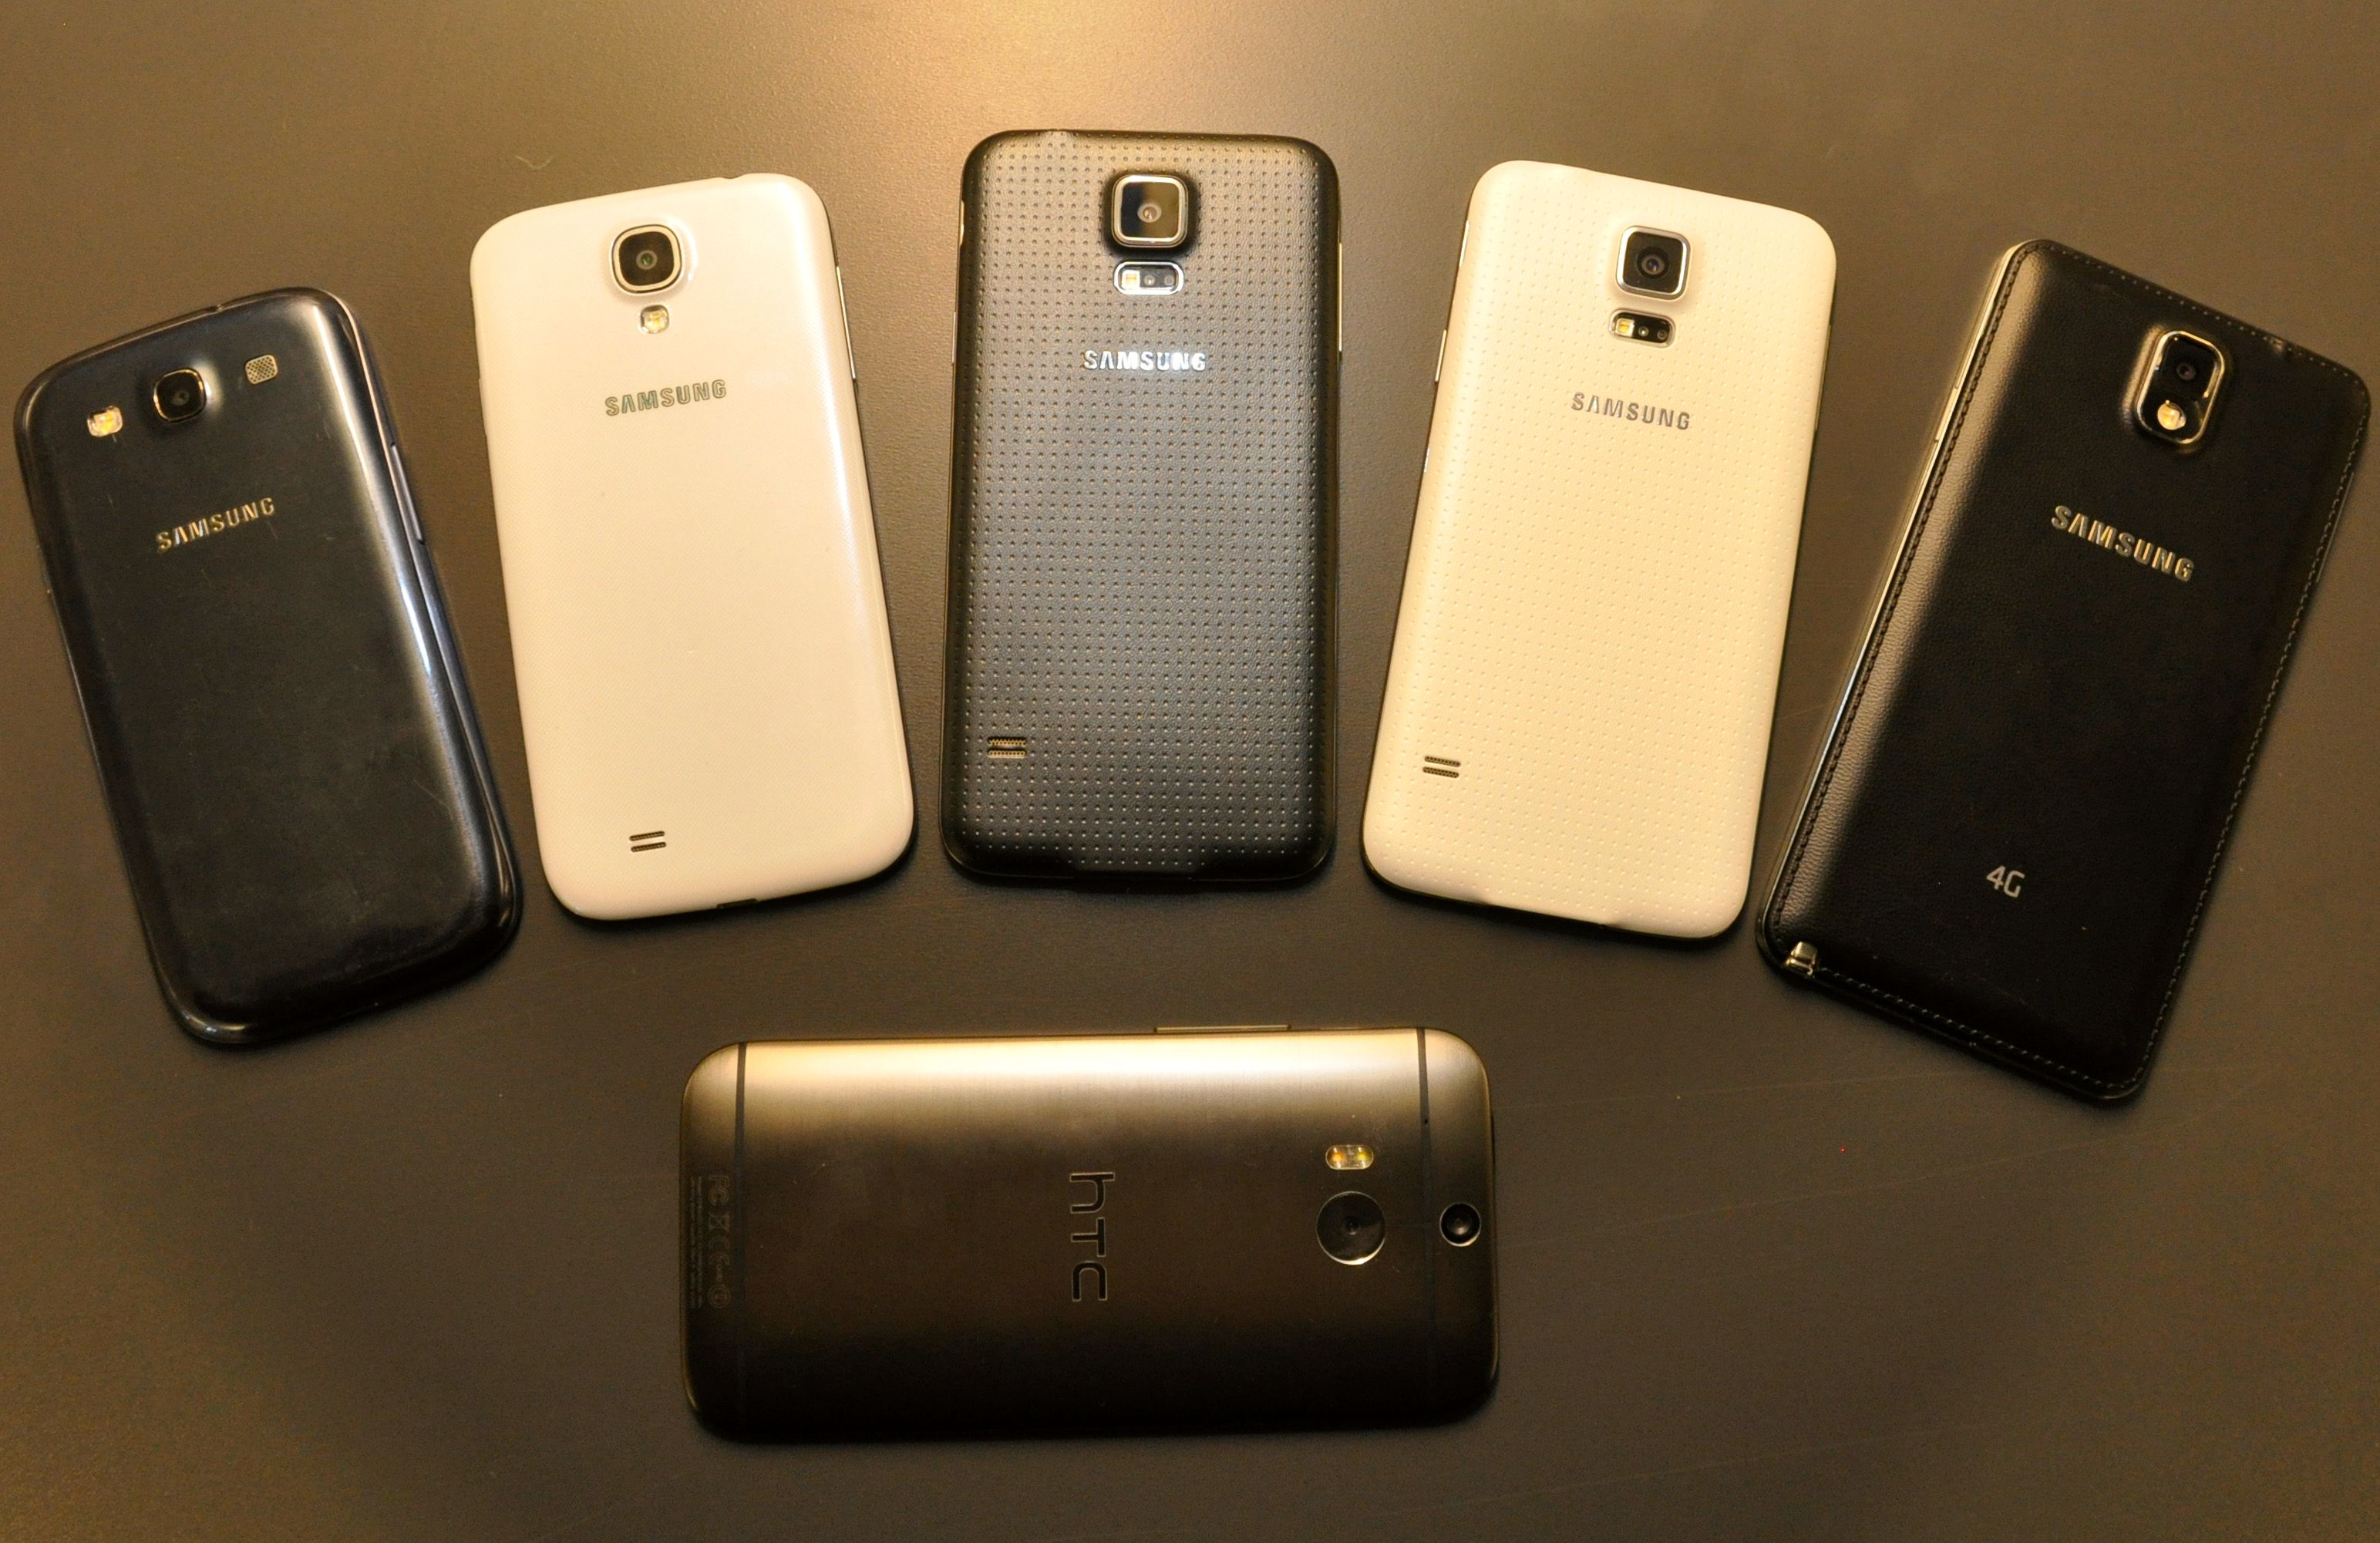 Fra venstre; Galaxy S3, Galaxy S4, Galaxy S5 i to ulike farger, og Galaxy Note 3. Nederst - utfordreren One (M8) fra HTC.Foto: Finn Jarle Kvalheim, Amobil.no